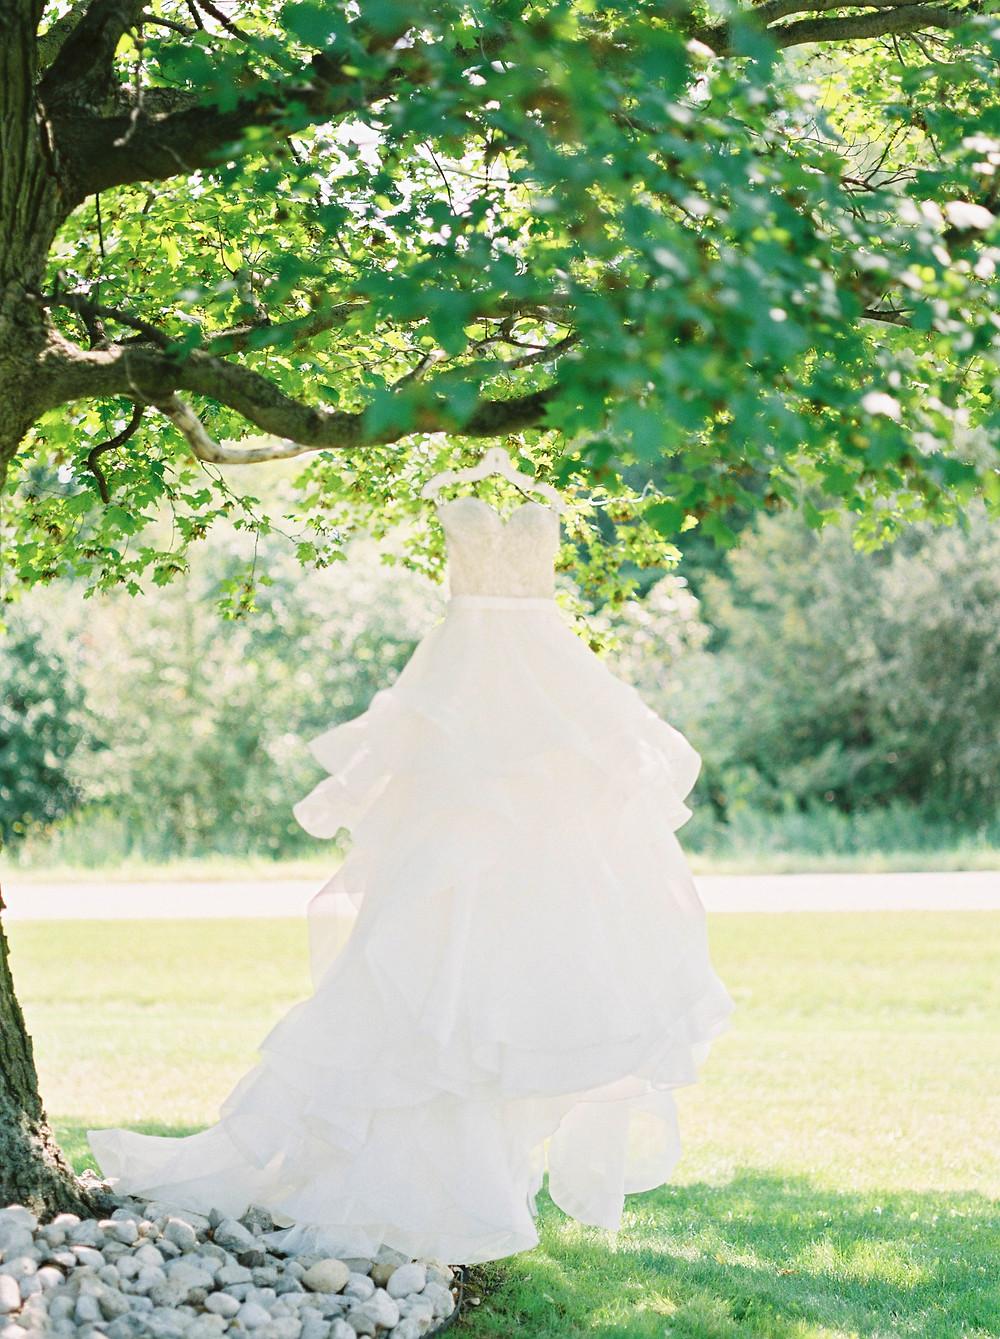 Wedding dress picutres